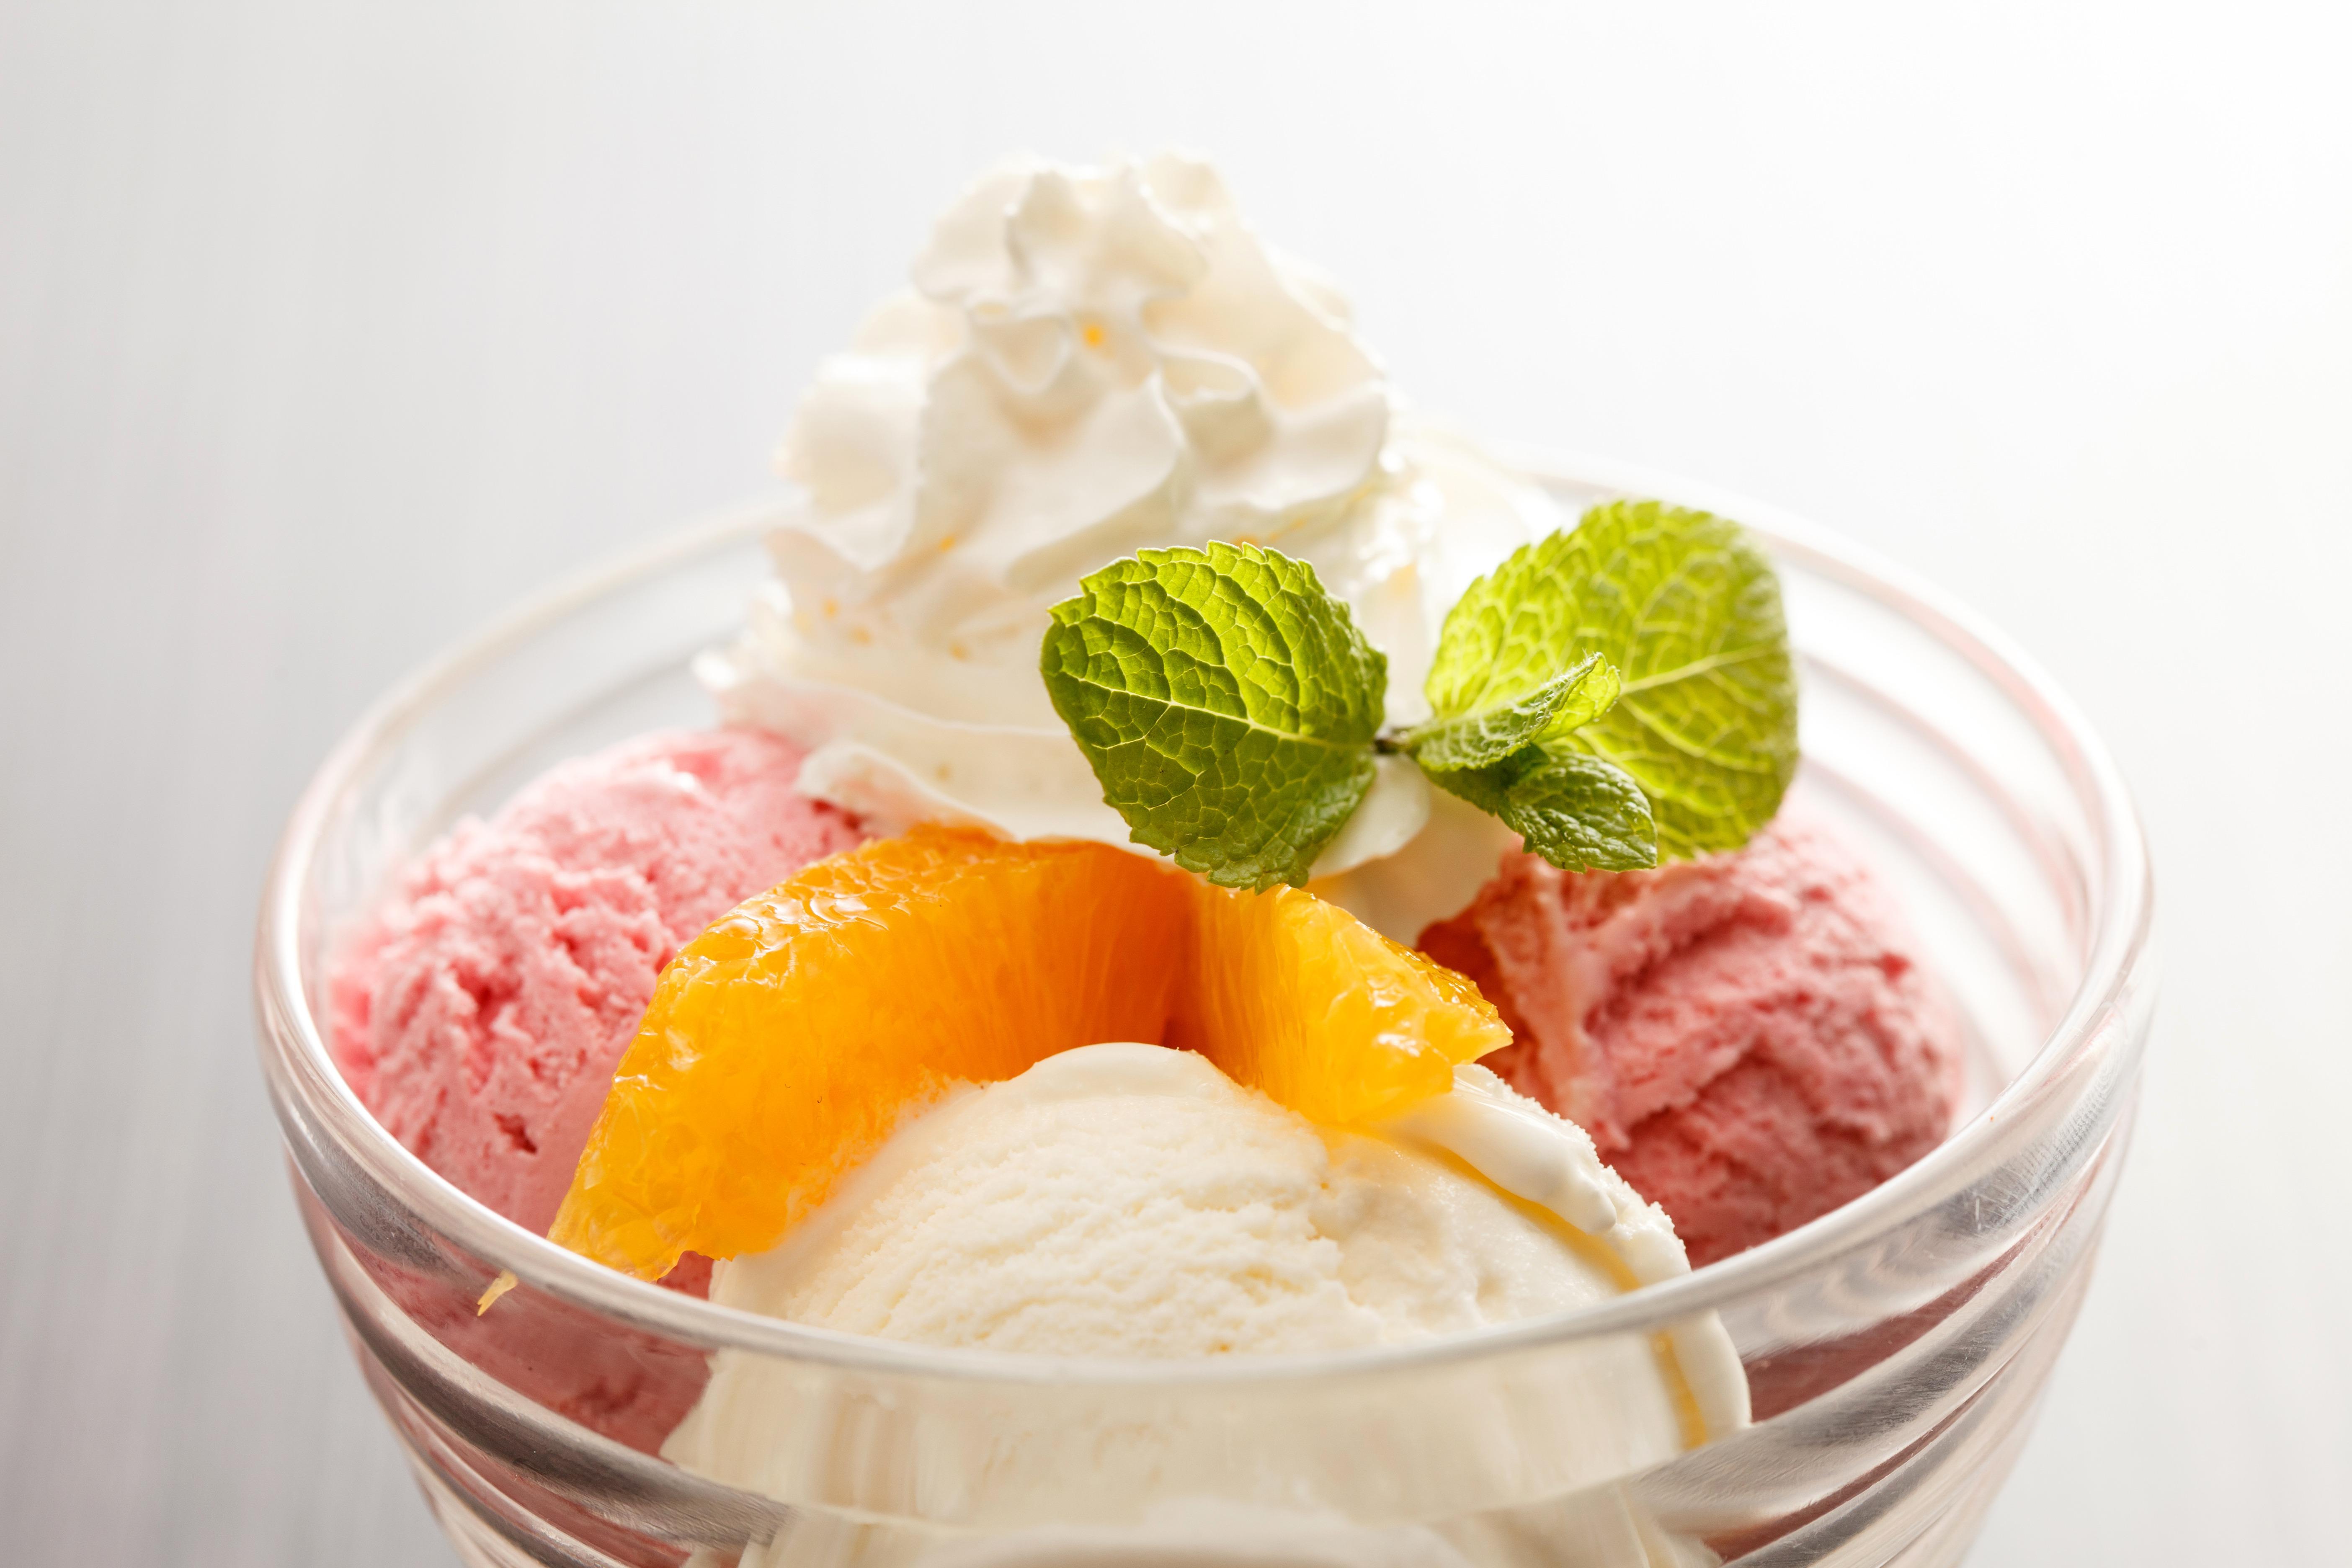 сама родом картинка мороженого кубиками креманке отличия